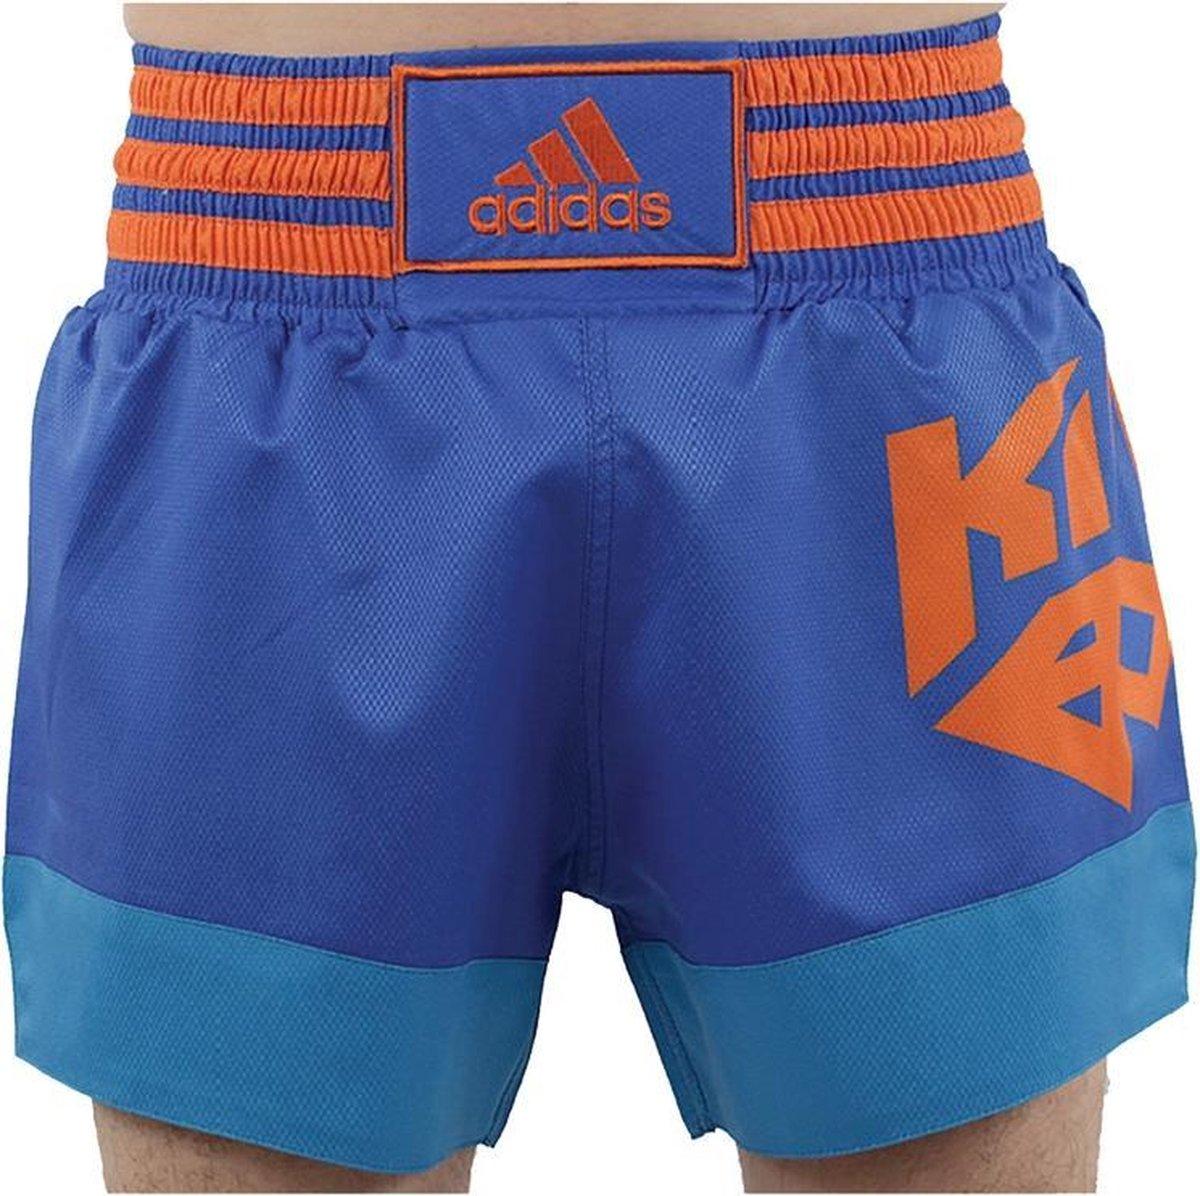 Adidas Speed Kickboksshort maat XL